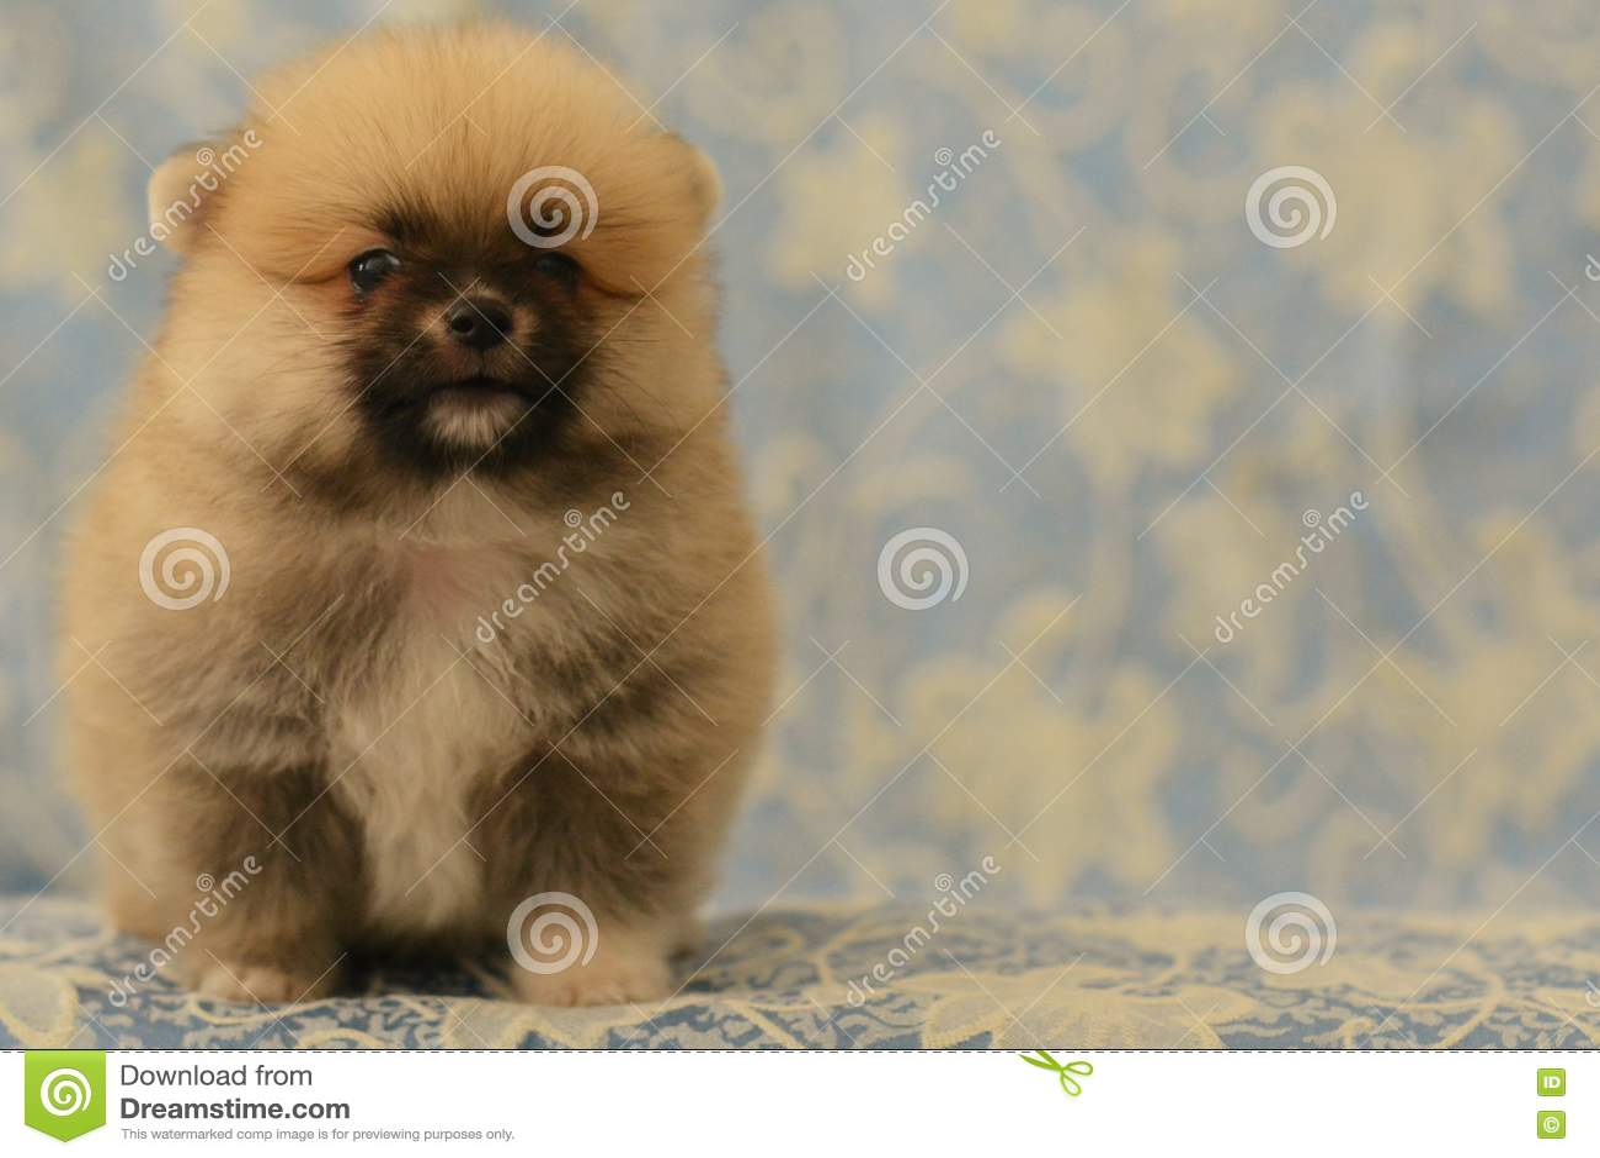 Cute Pomeranian Baby Dog Barks Stock Photo Image Of Beige Face